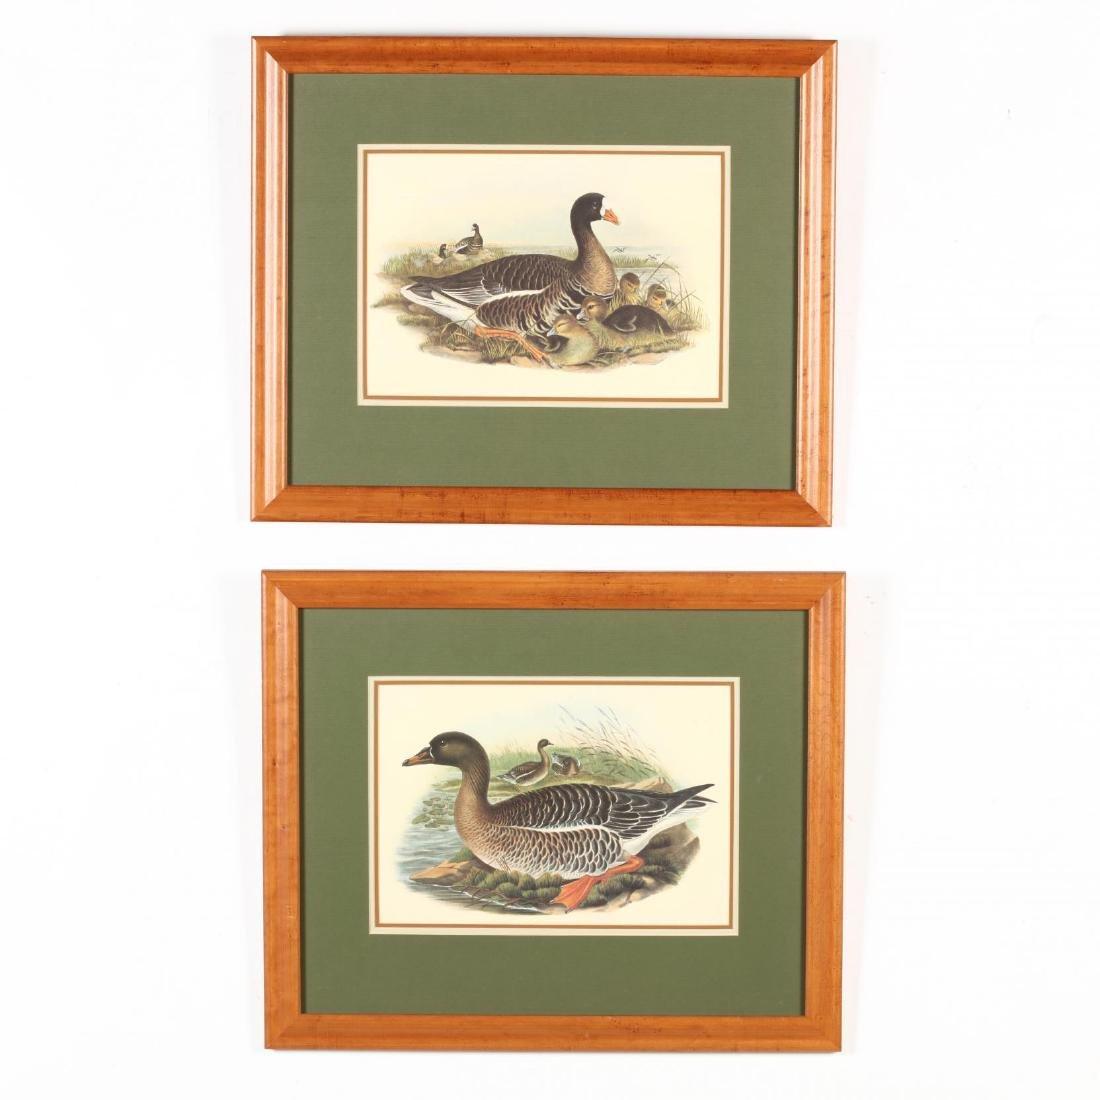 Pair of Framed Ornithological Prints